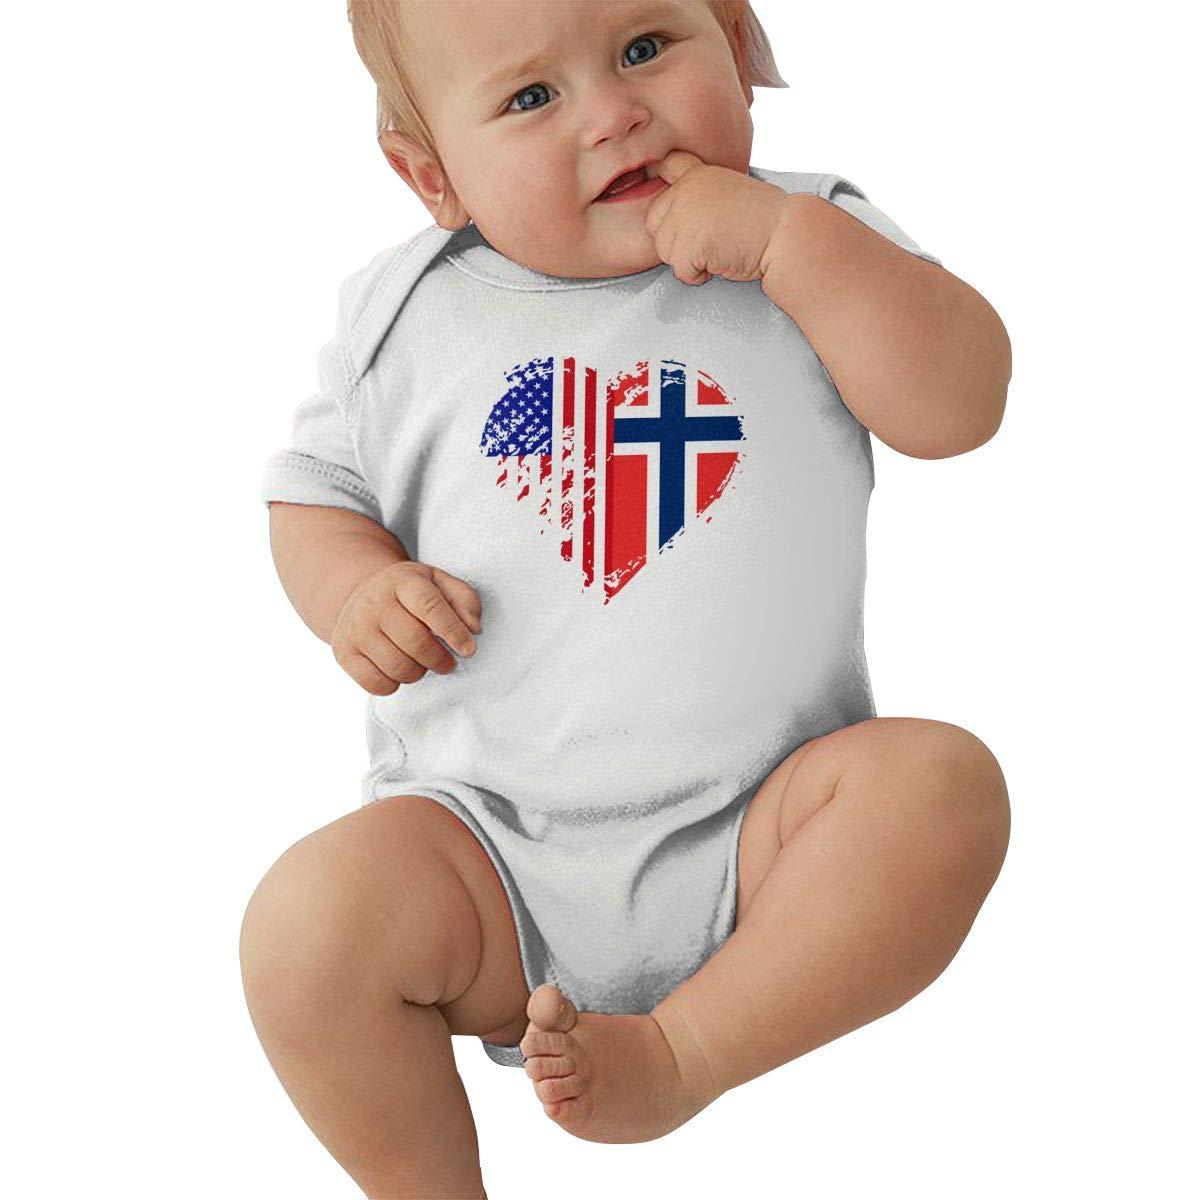 Mri-le2 Infant Short Sleeve Bodysuit Grungy Norway American Flag Heart Toddler Jumpsuit